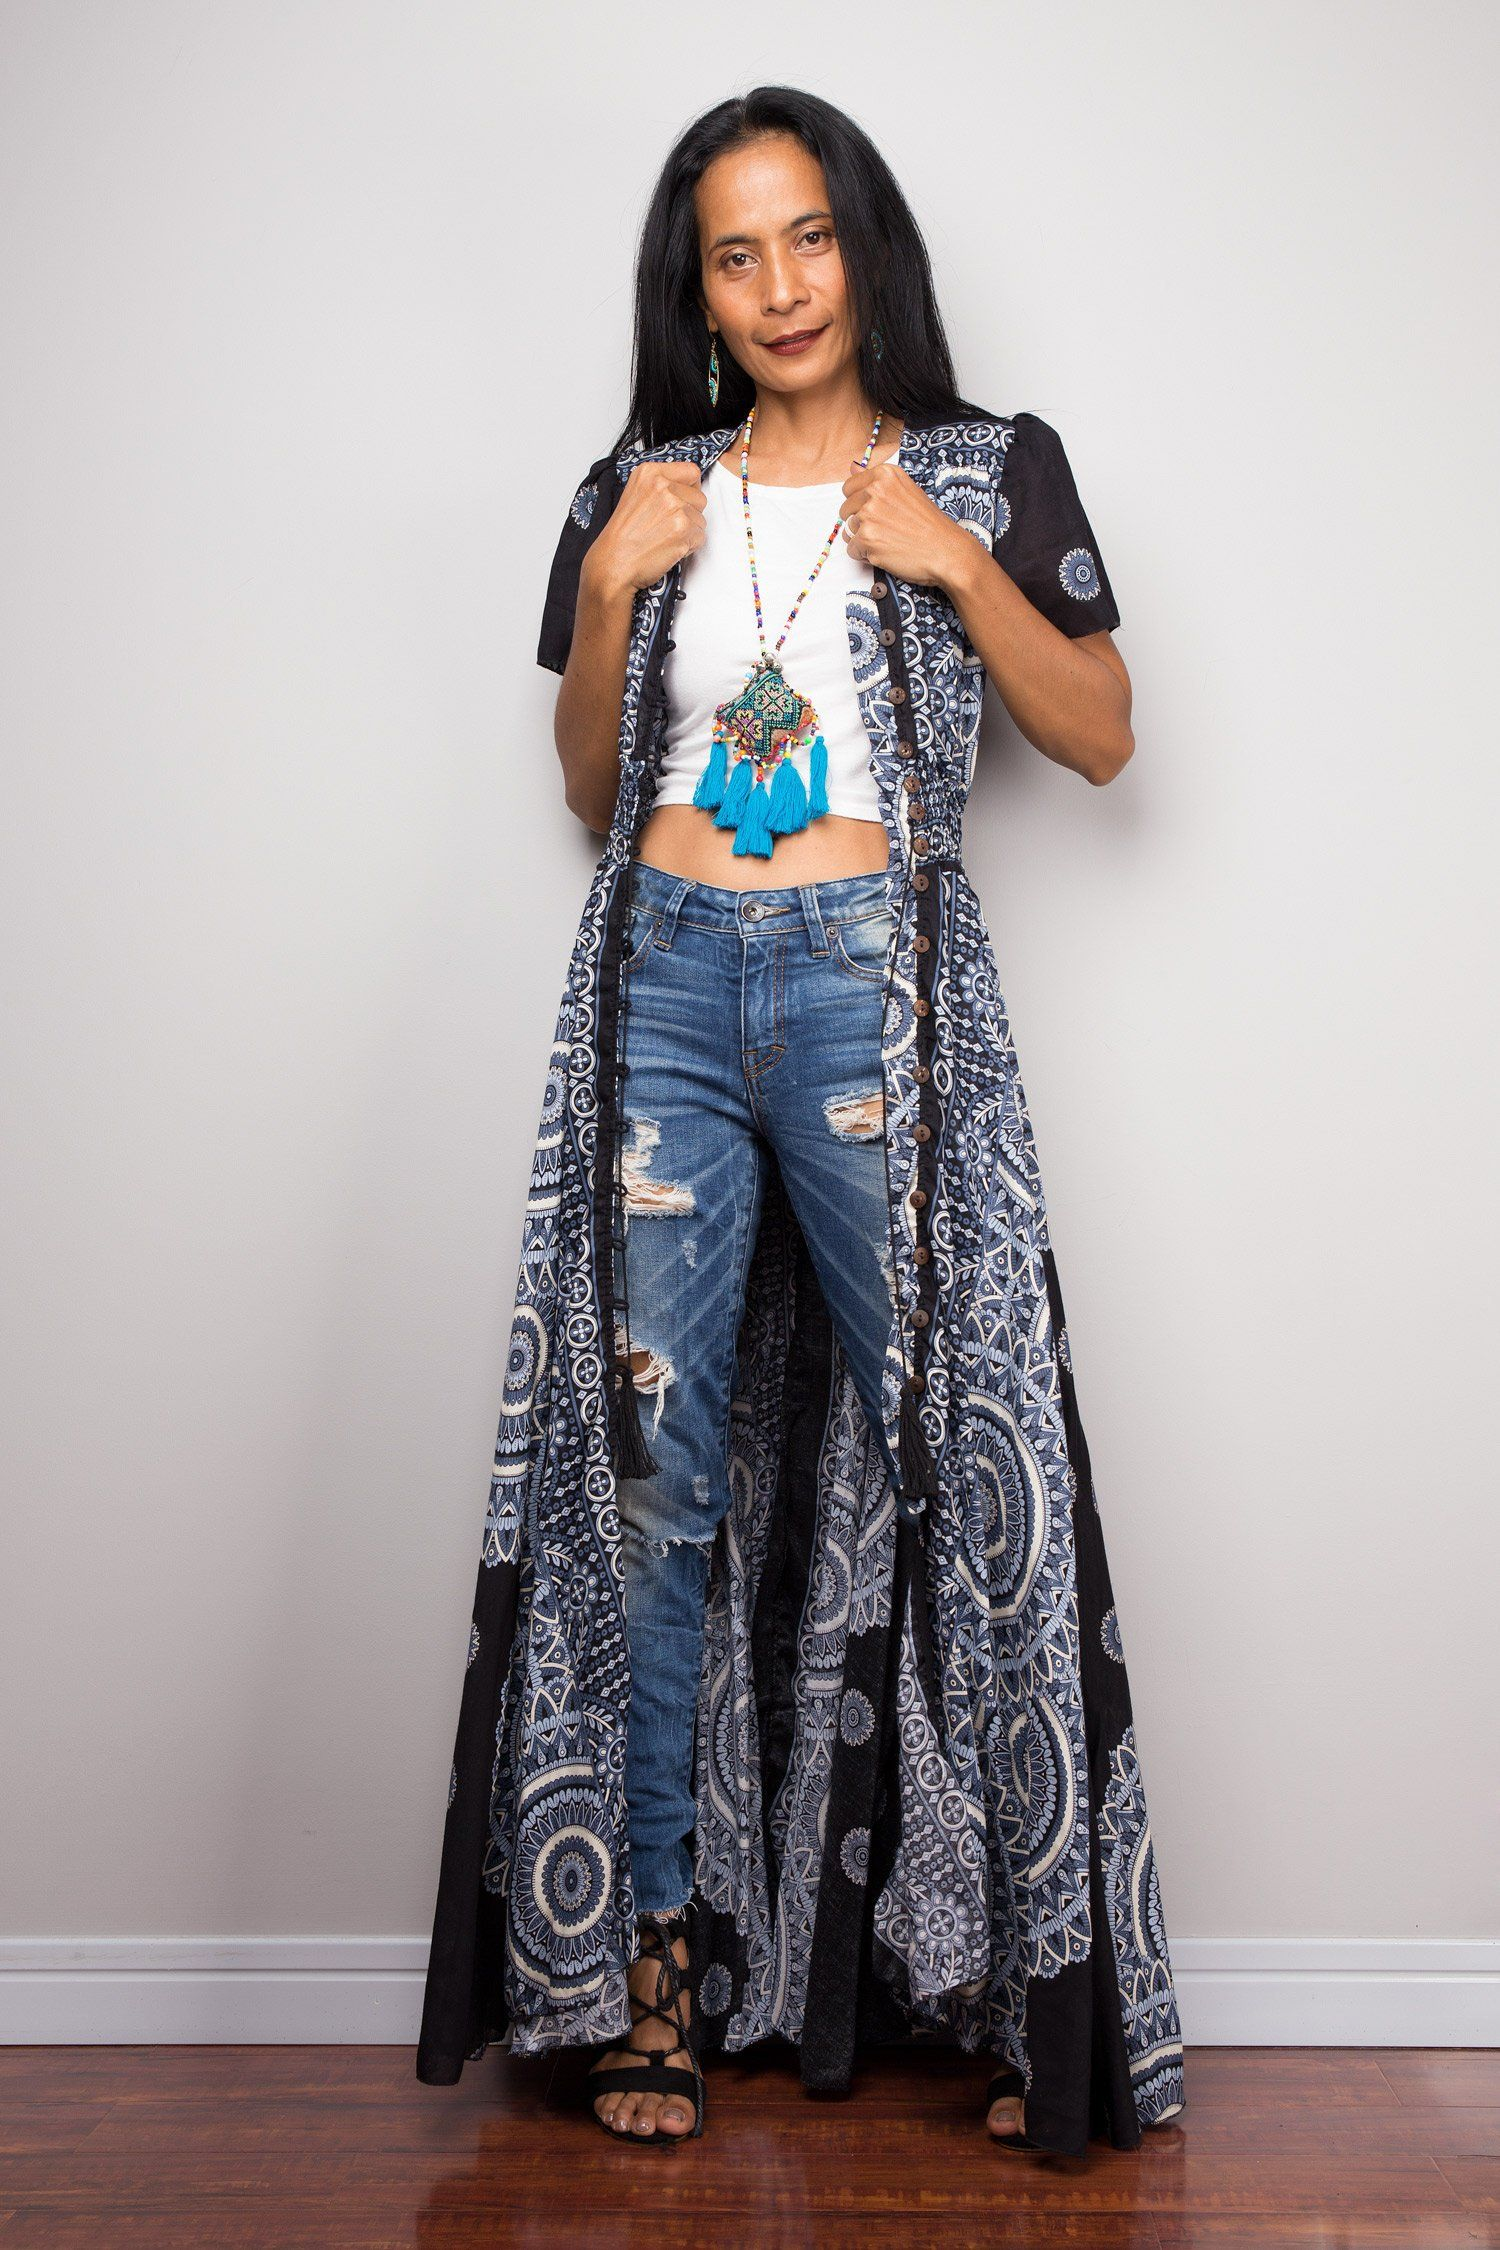 Boho Duster Dress | Bohemian Garden Party Dress | Smocked Waist Shirt Dress with short sleeves | Gypsy duster 3